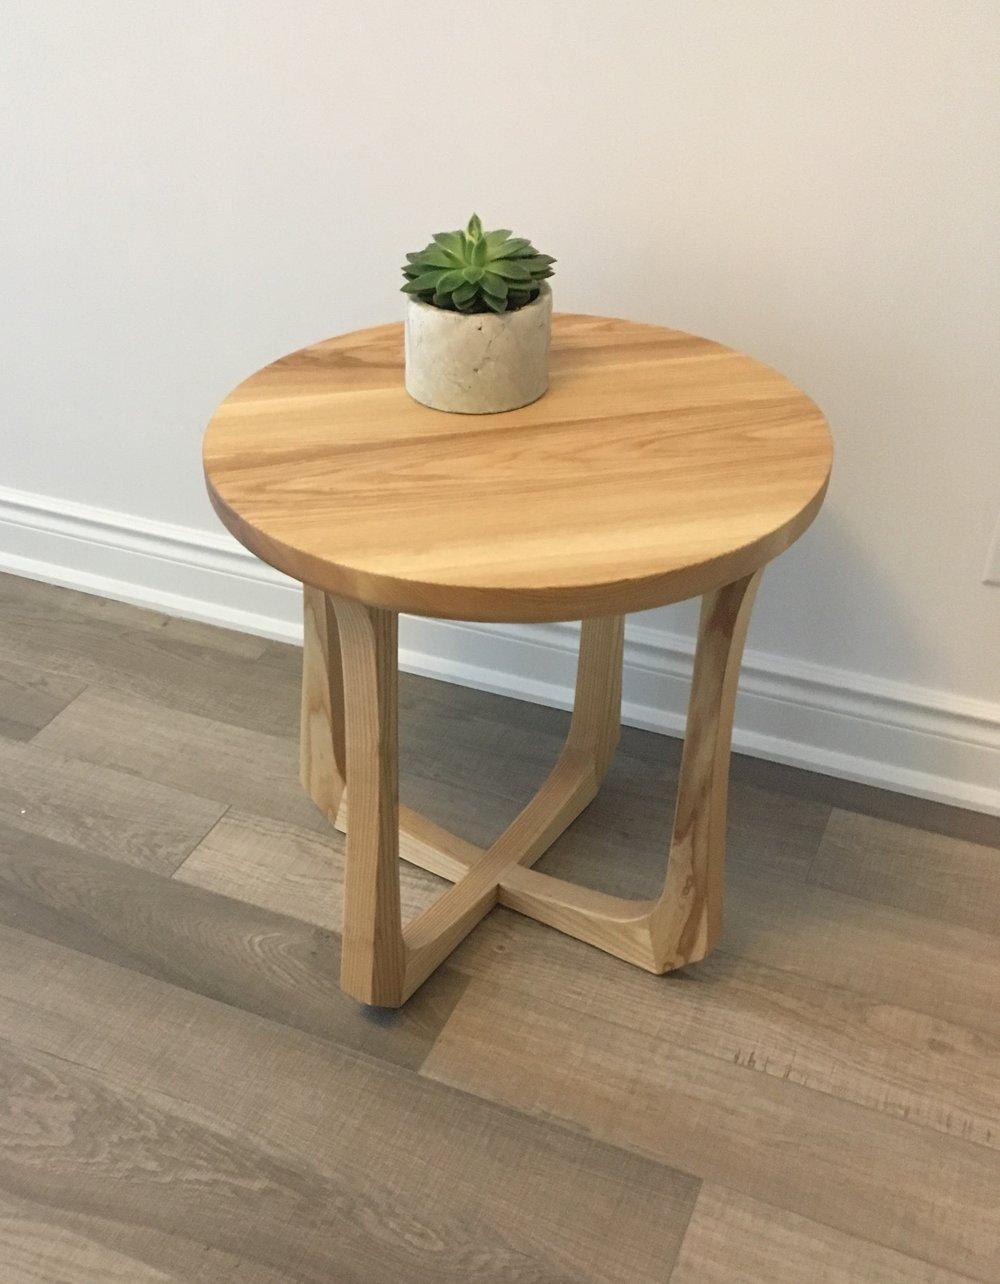 wood_table7.JPG